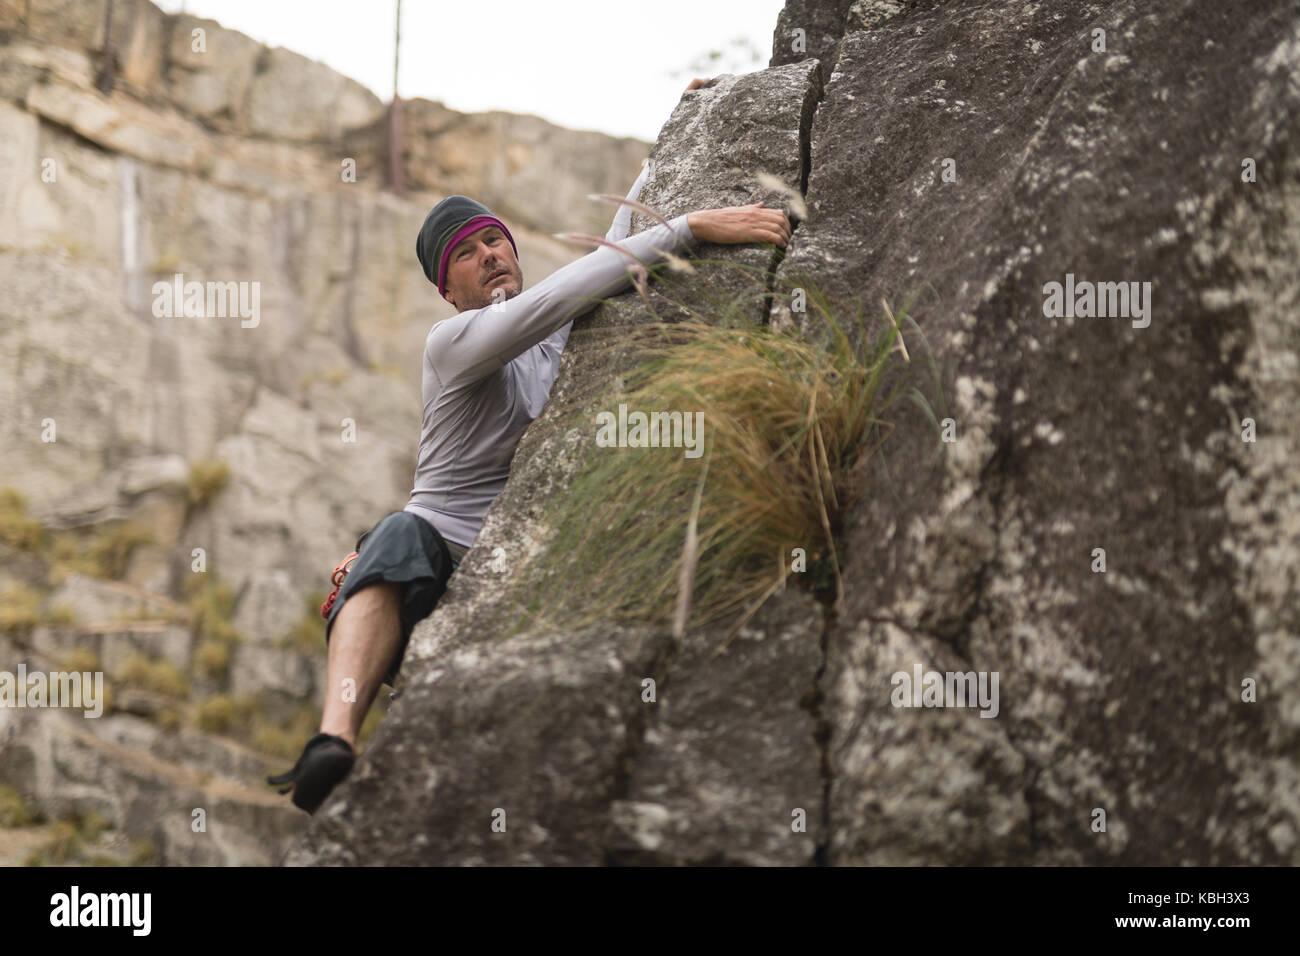 Determined man climbing mountain - Stock Image